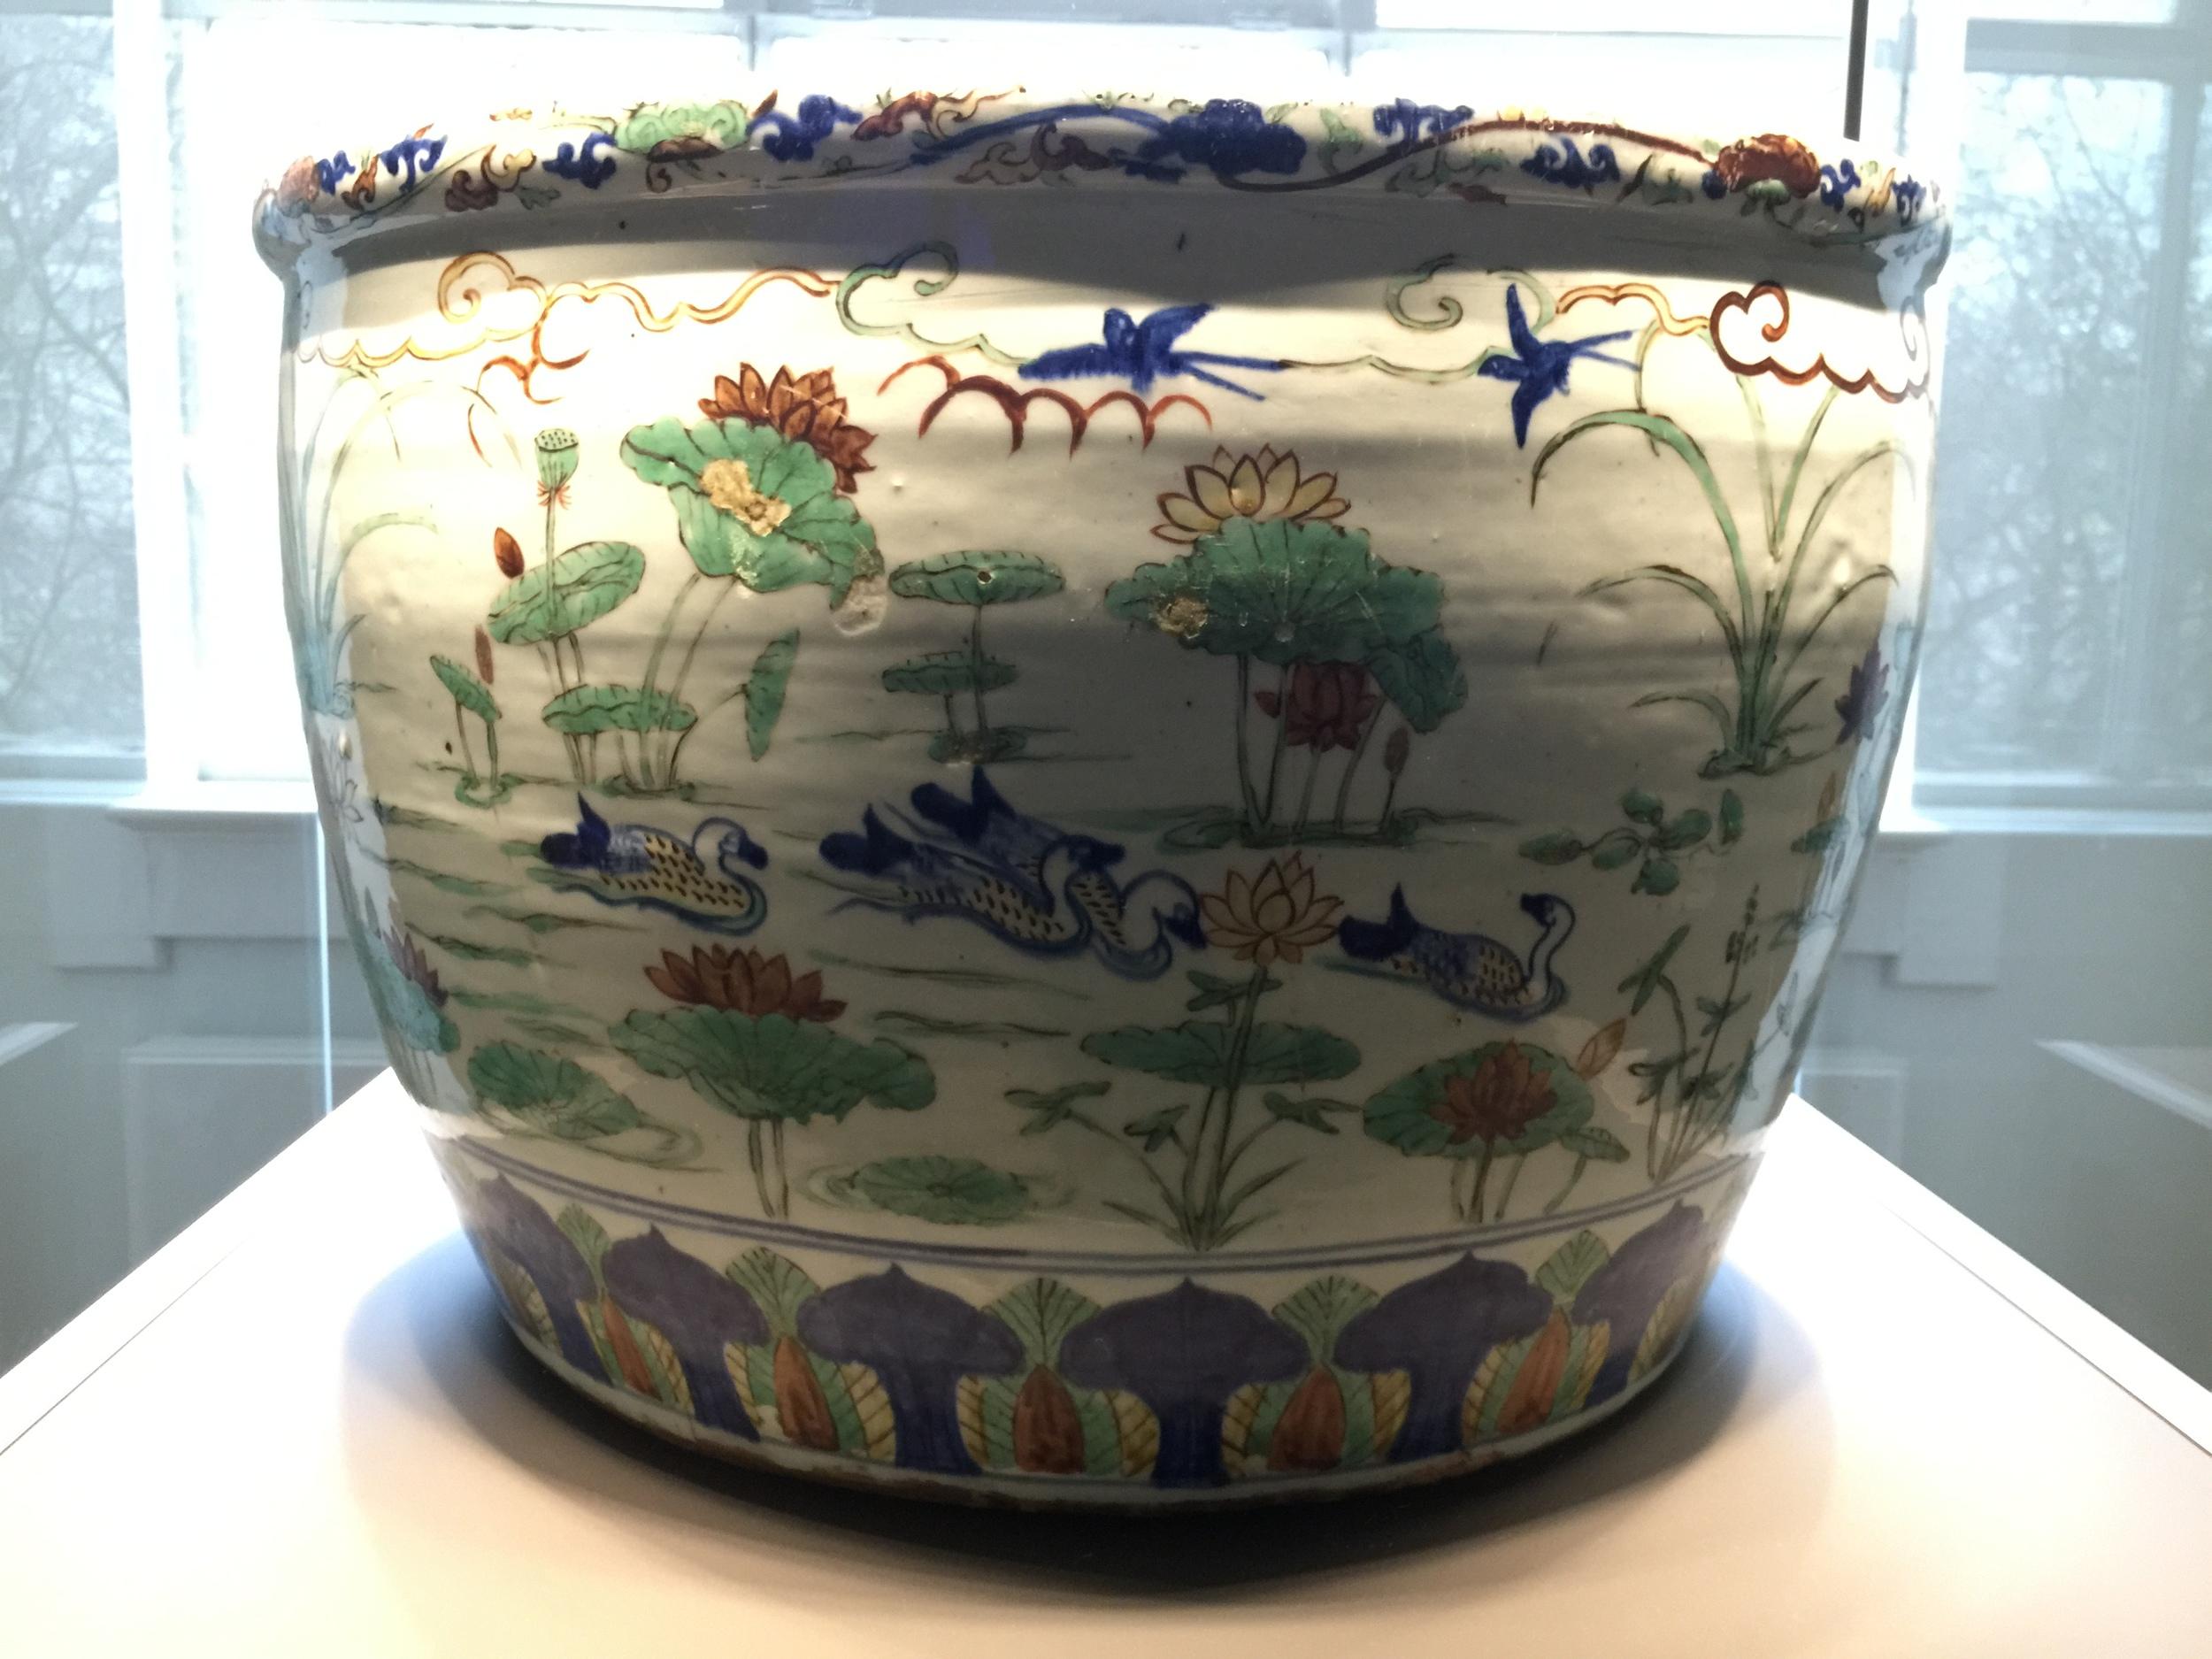 Chinese-Porcelain-British-Museum-Percival-David-jessewaugh.com-18.jpg